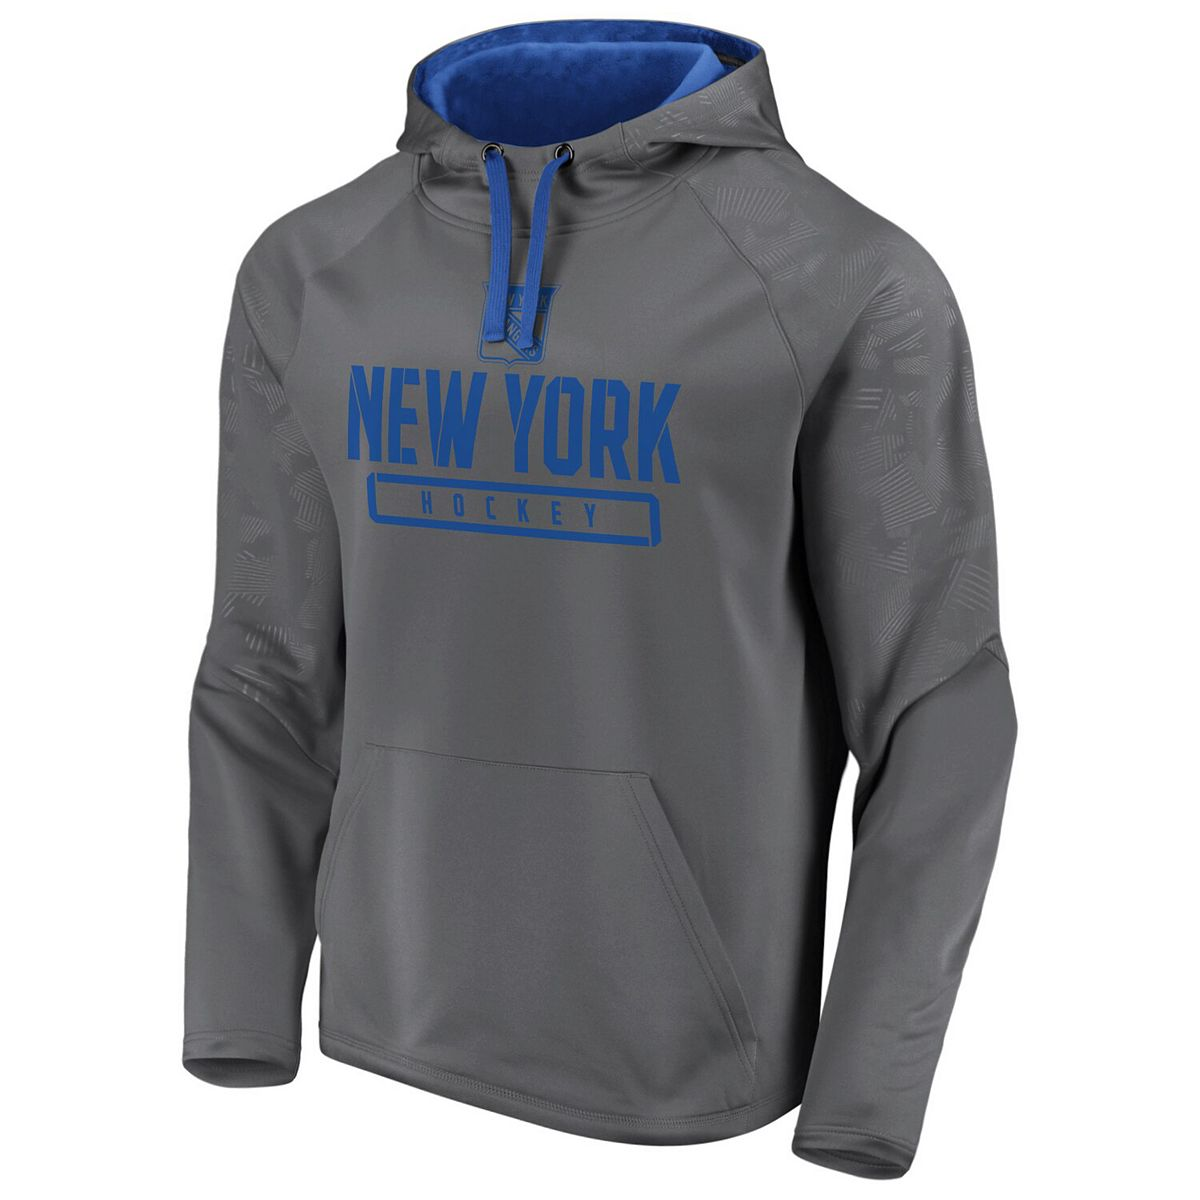 Men's Fanatics Branded Gray New York Rangers Defender Monochrome Engage Raglan Pullover Hoodie n4CrM